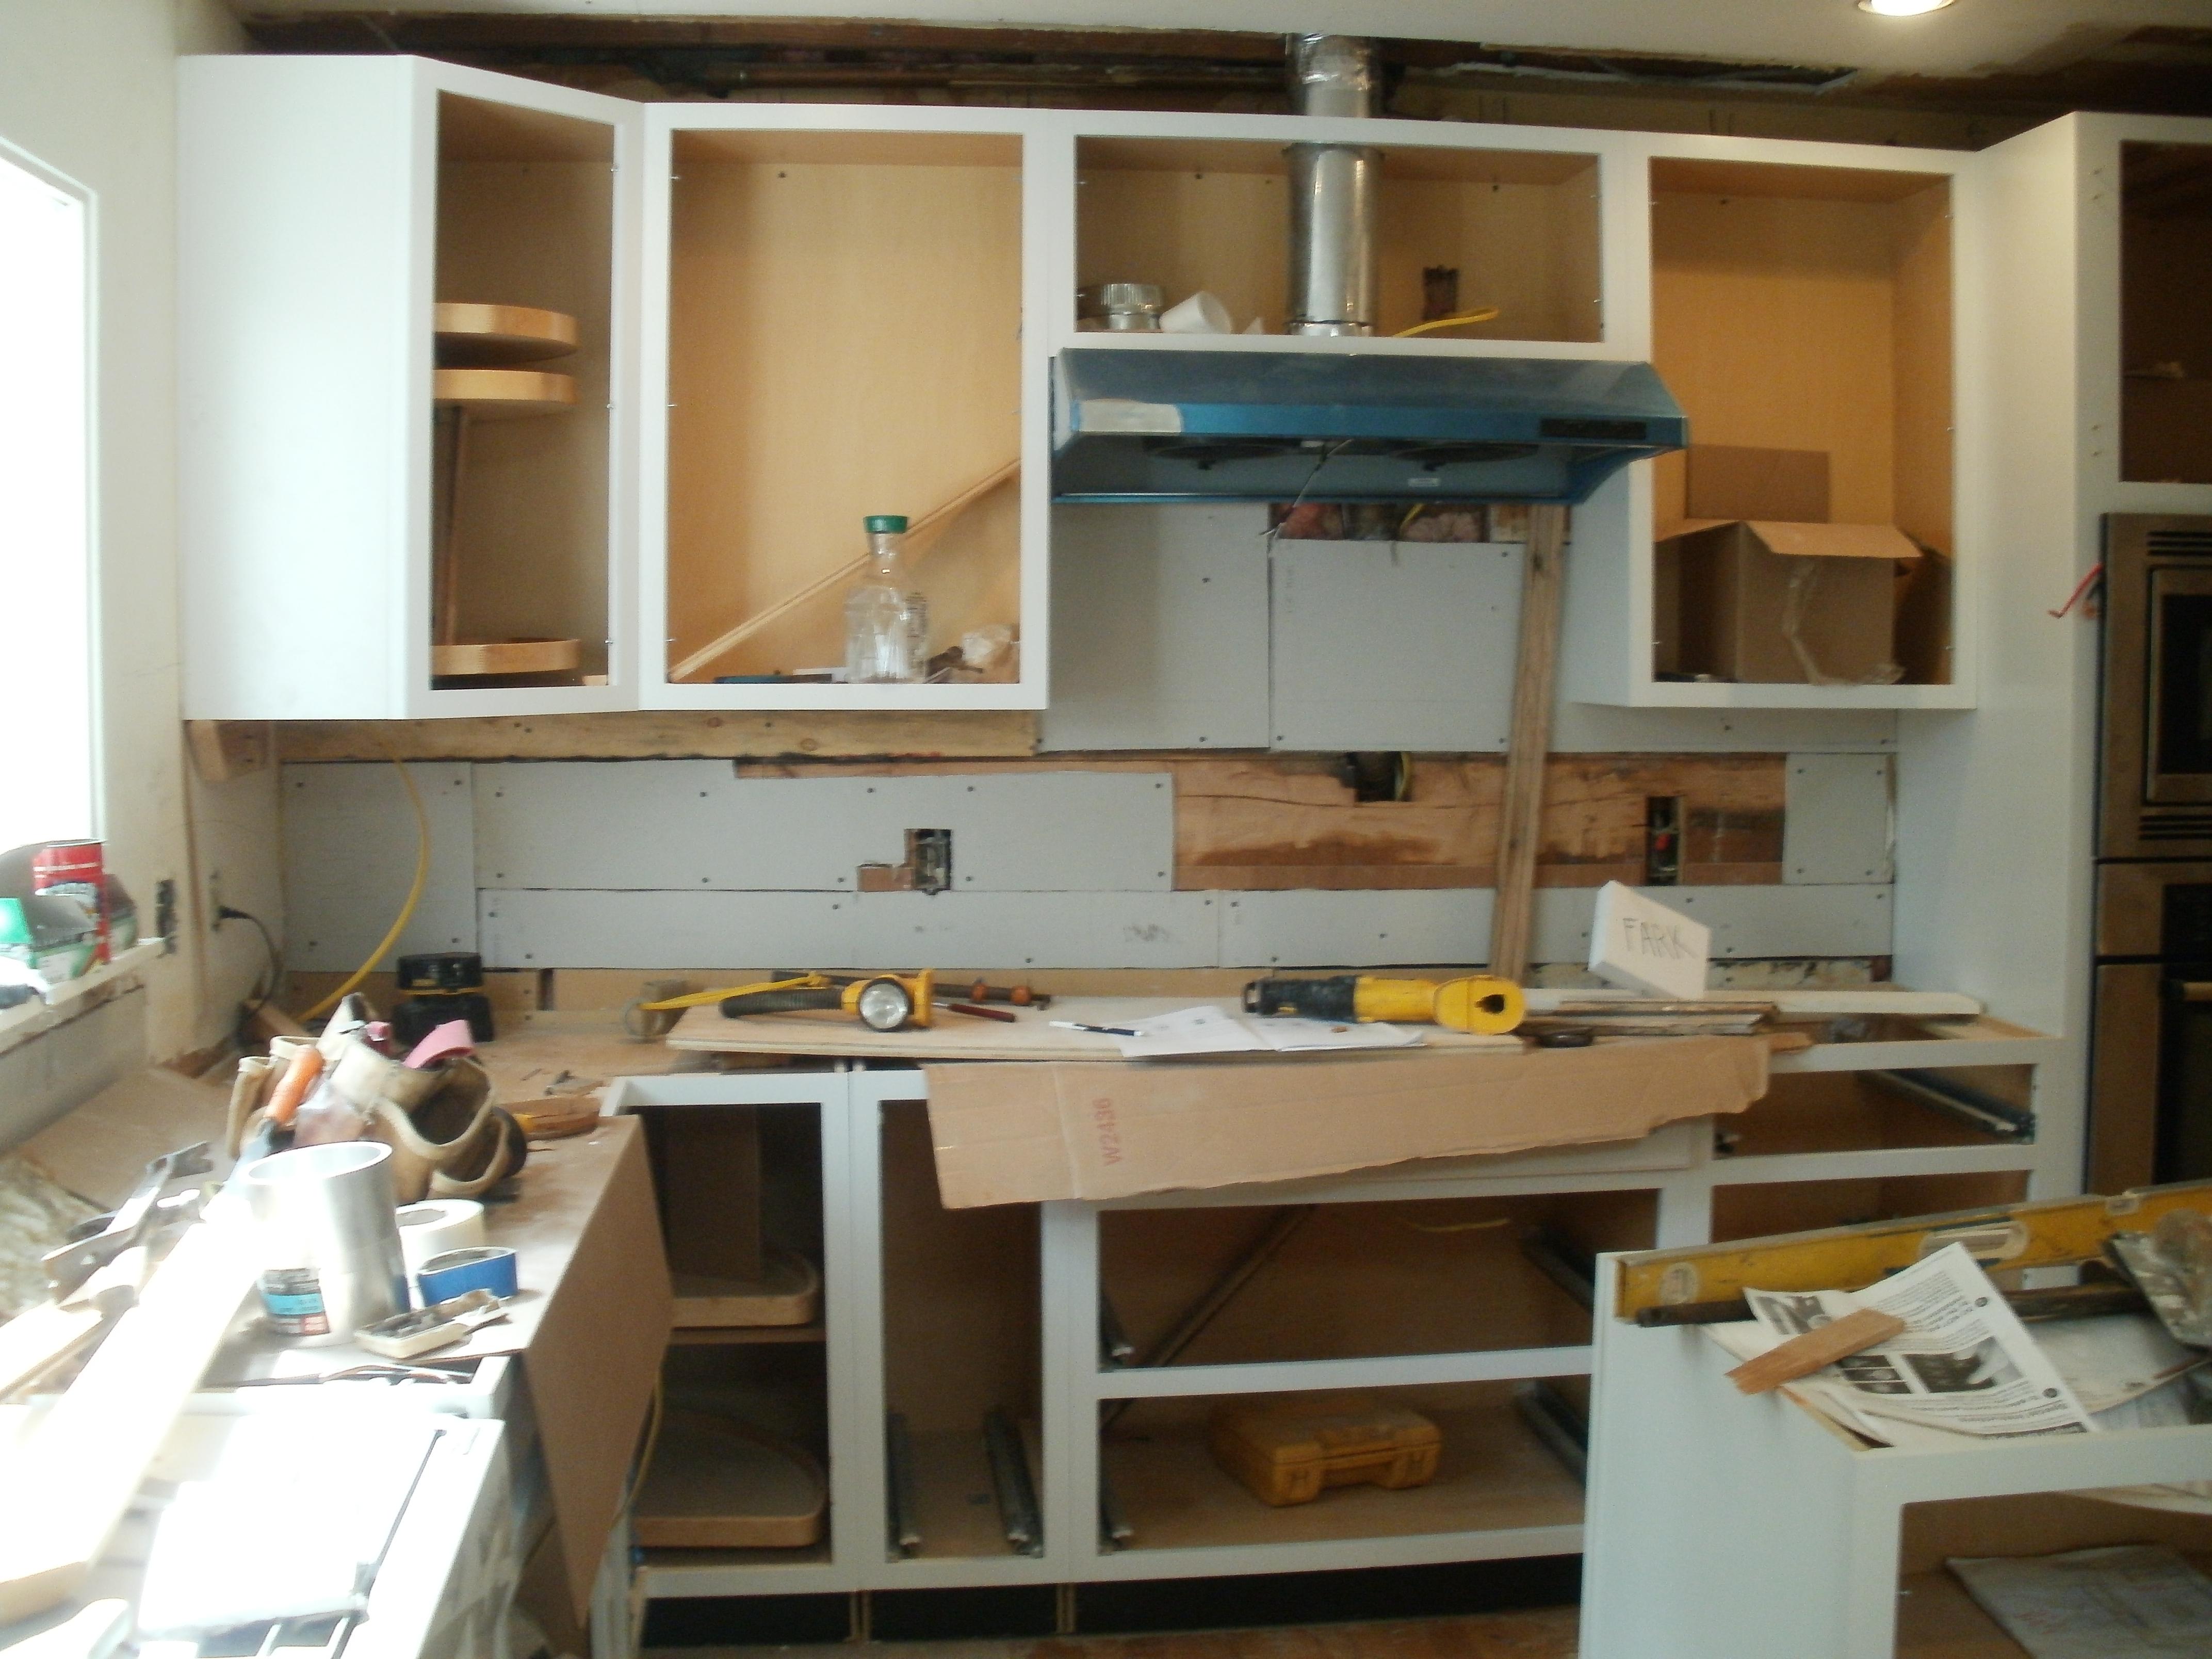 case study 4: greenwich ct luxury kitchen remodel – broadbent